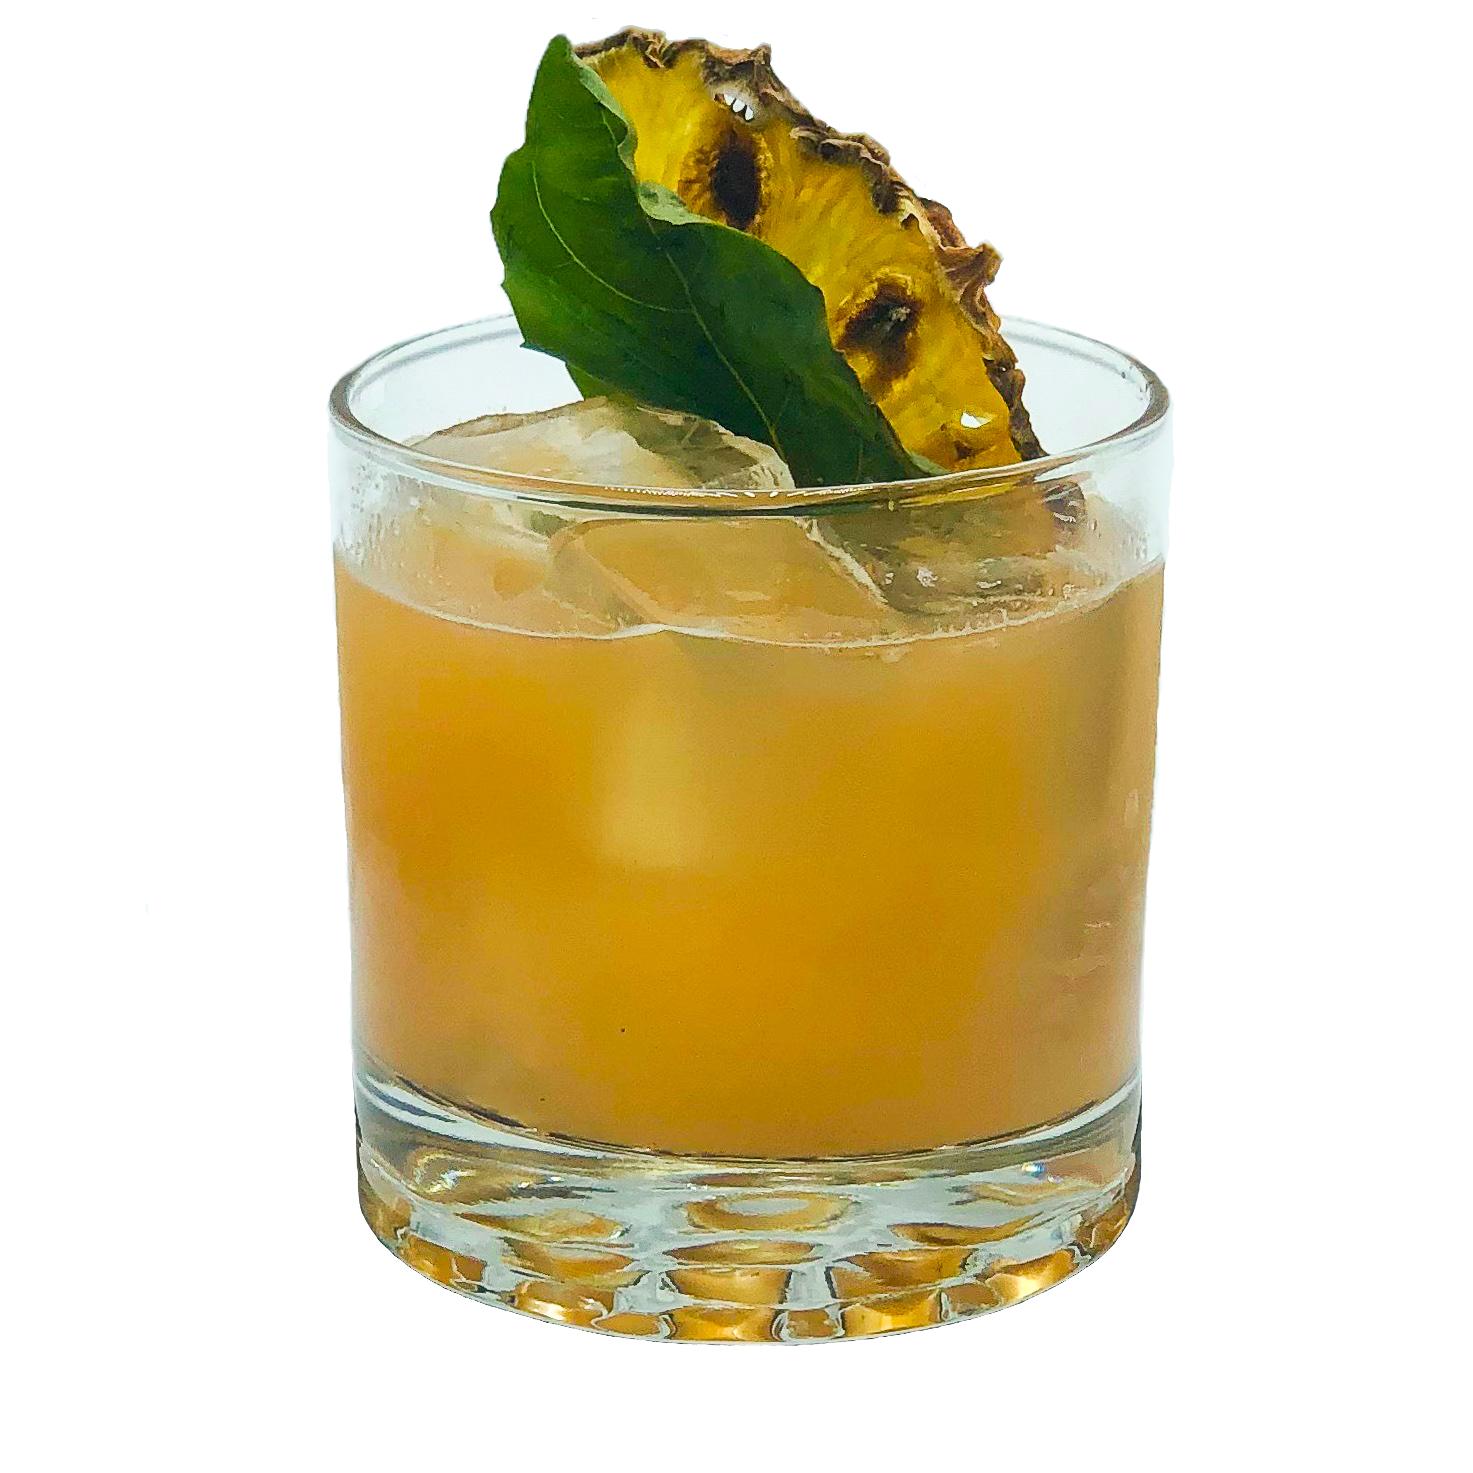 Pineapple Basil Smash